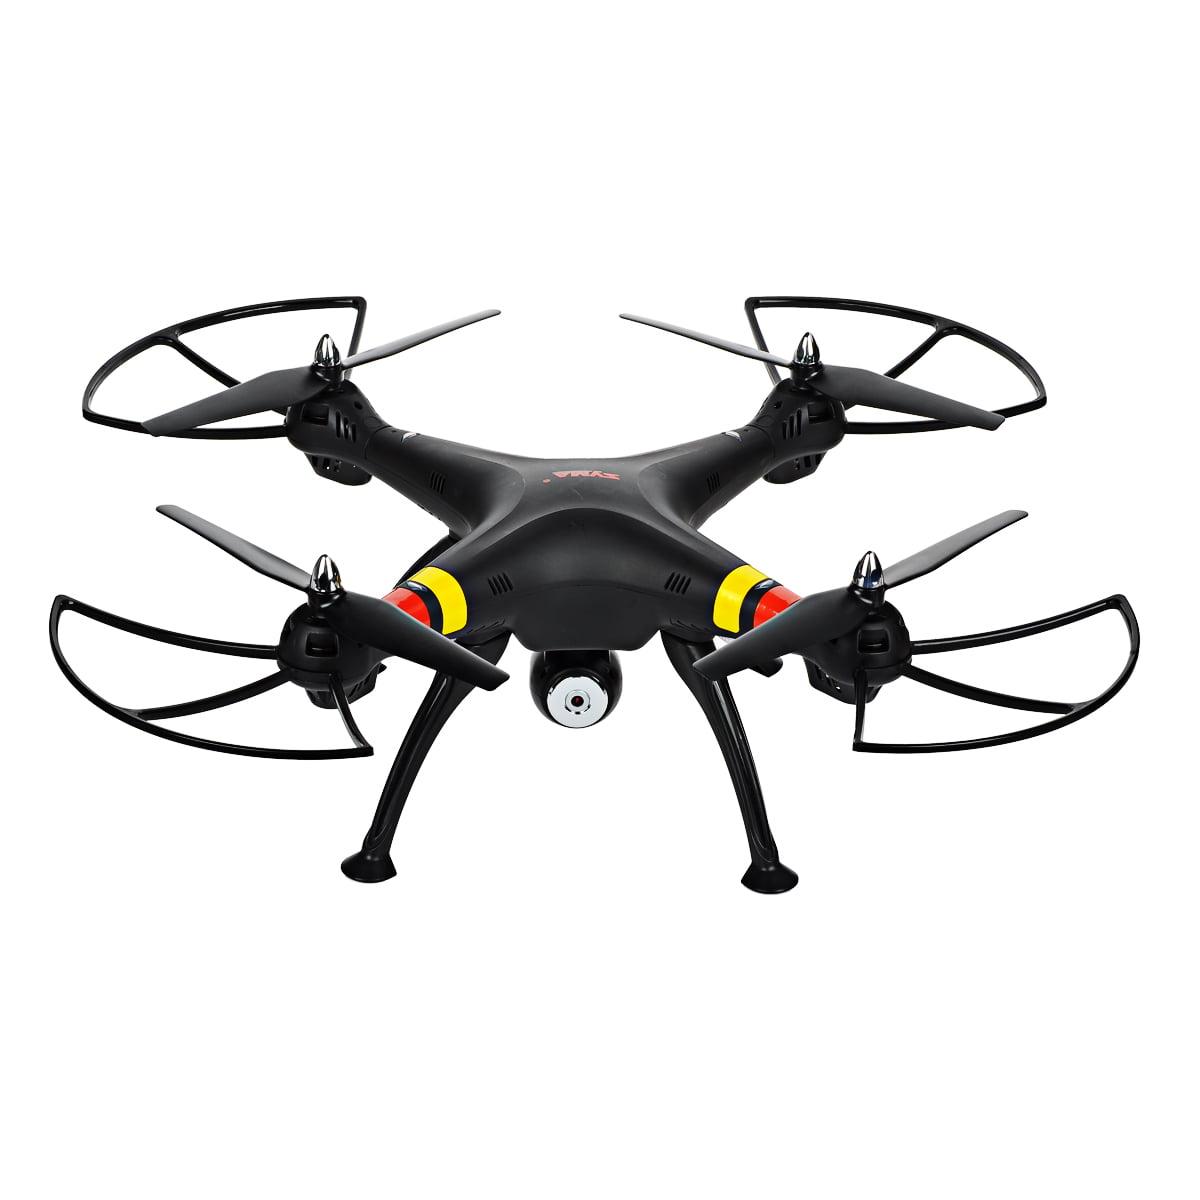 2.4GHz 4-CH R/C Radio Control Quadcopter with Gyro / 0.3MP Camera / Wi-Fi